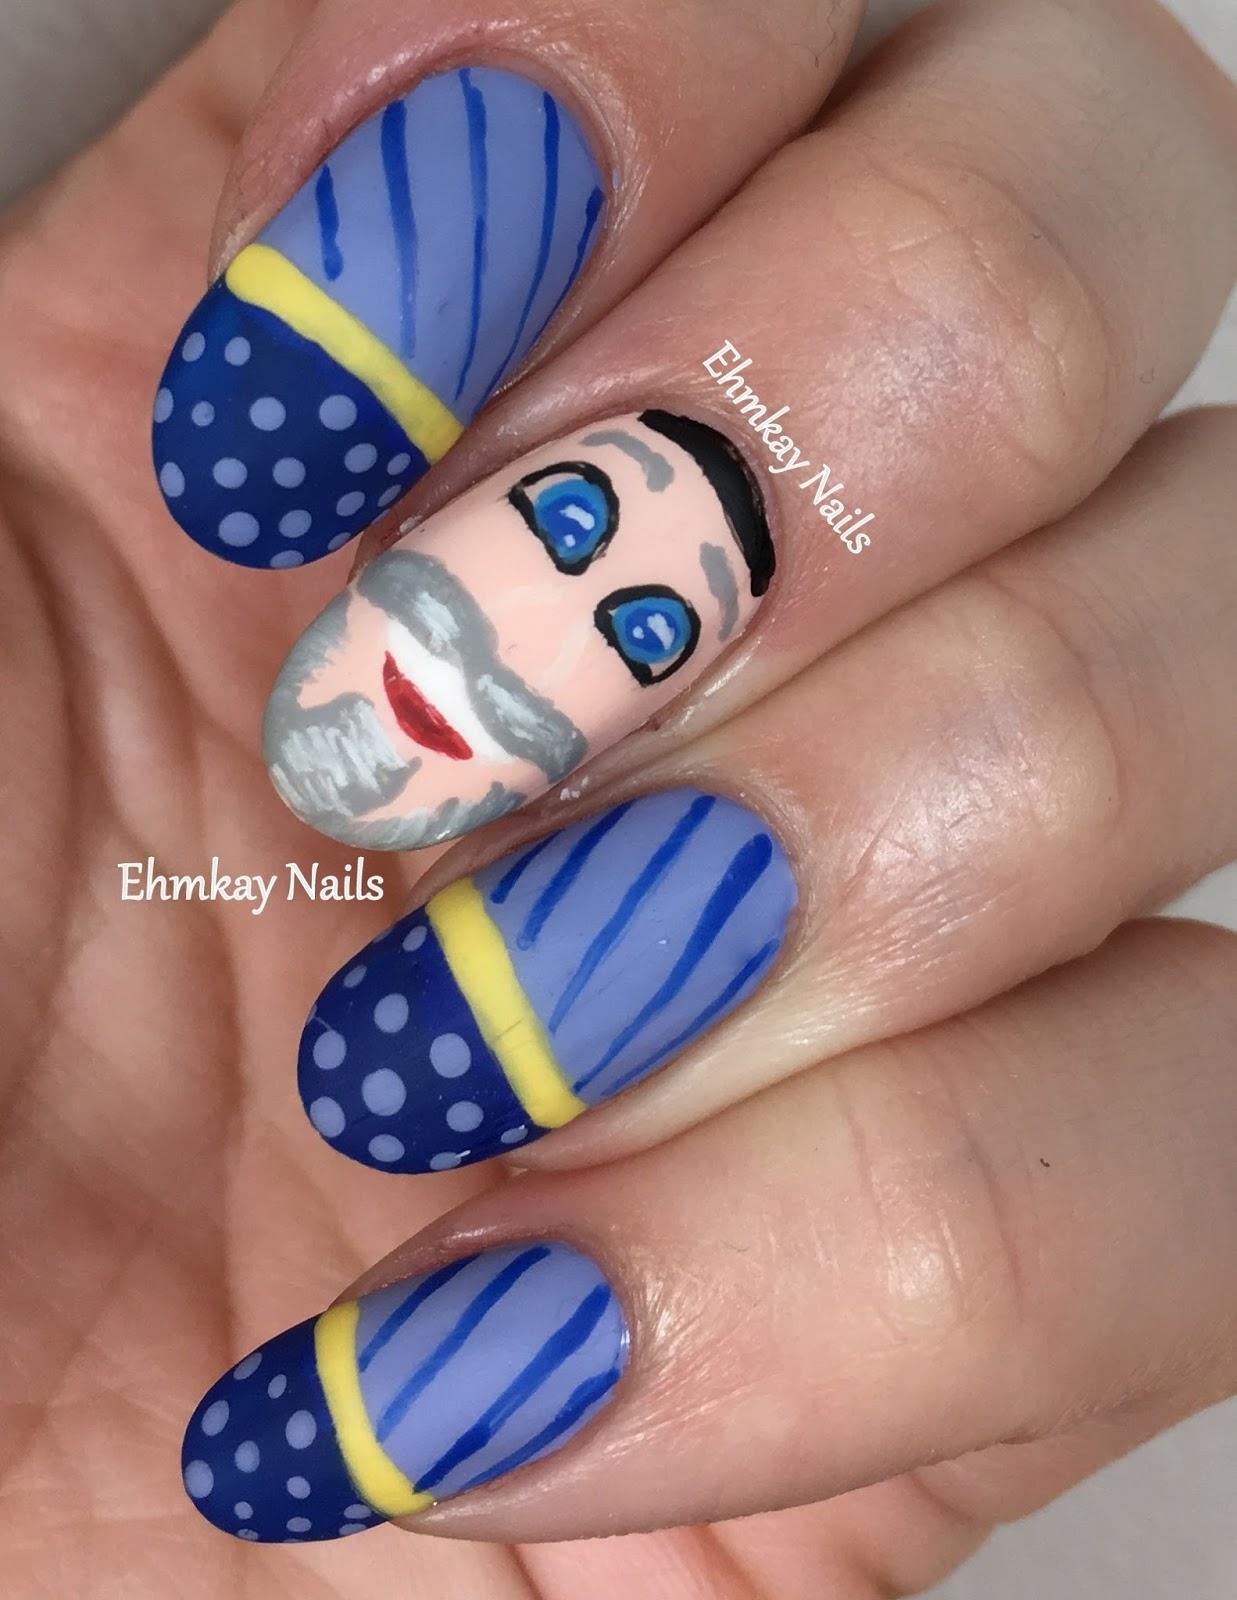 Ehmkay Nails: Mensch On A Bench Nail Art